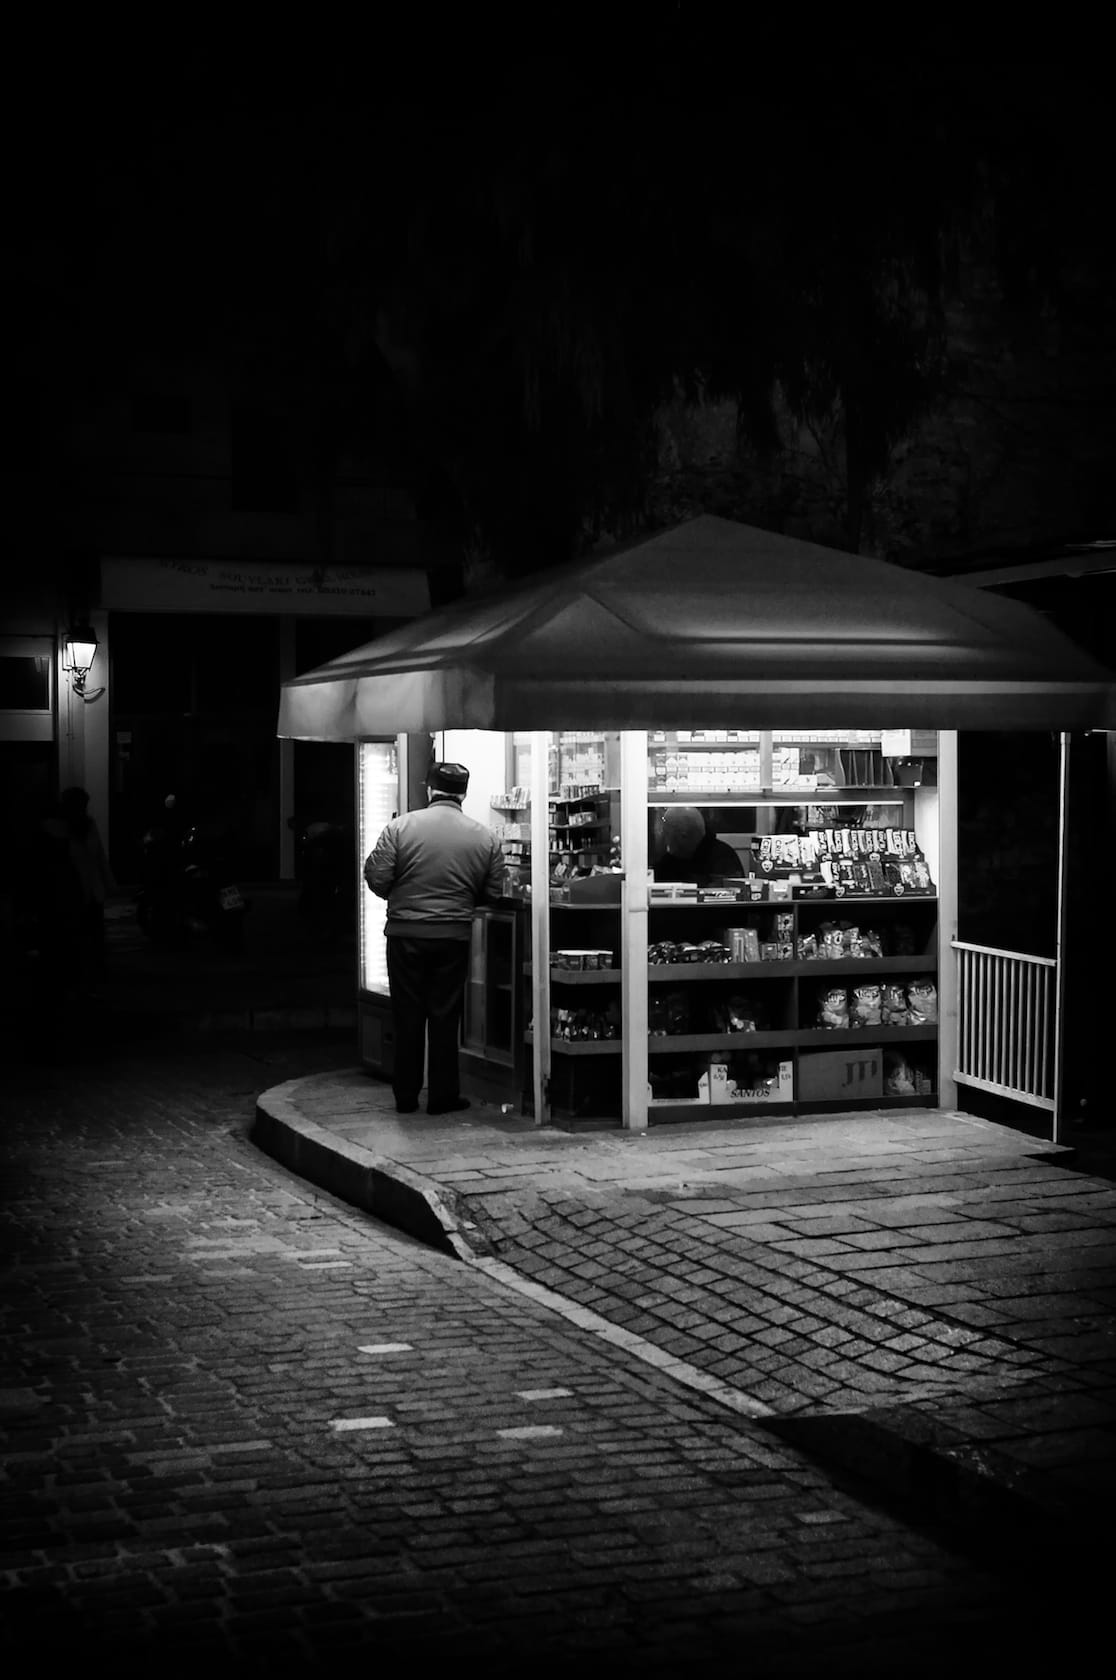 The kiosk at Platanos